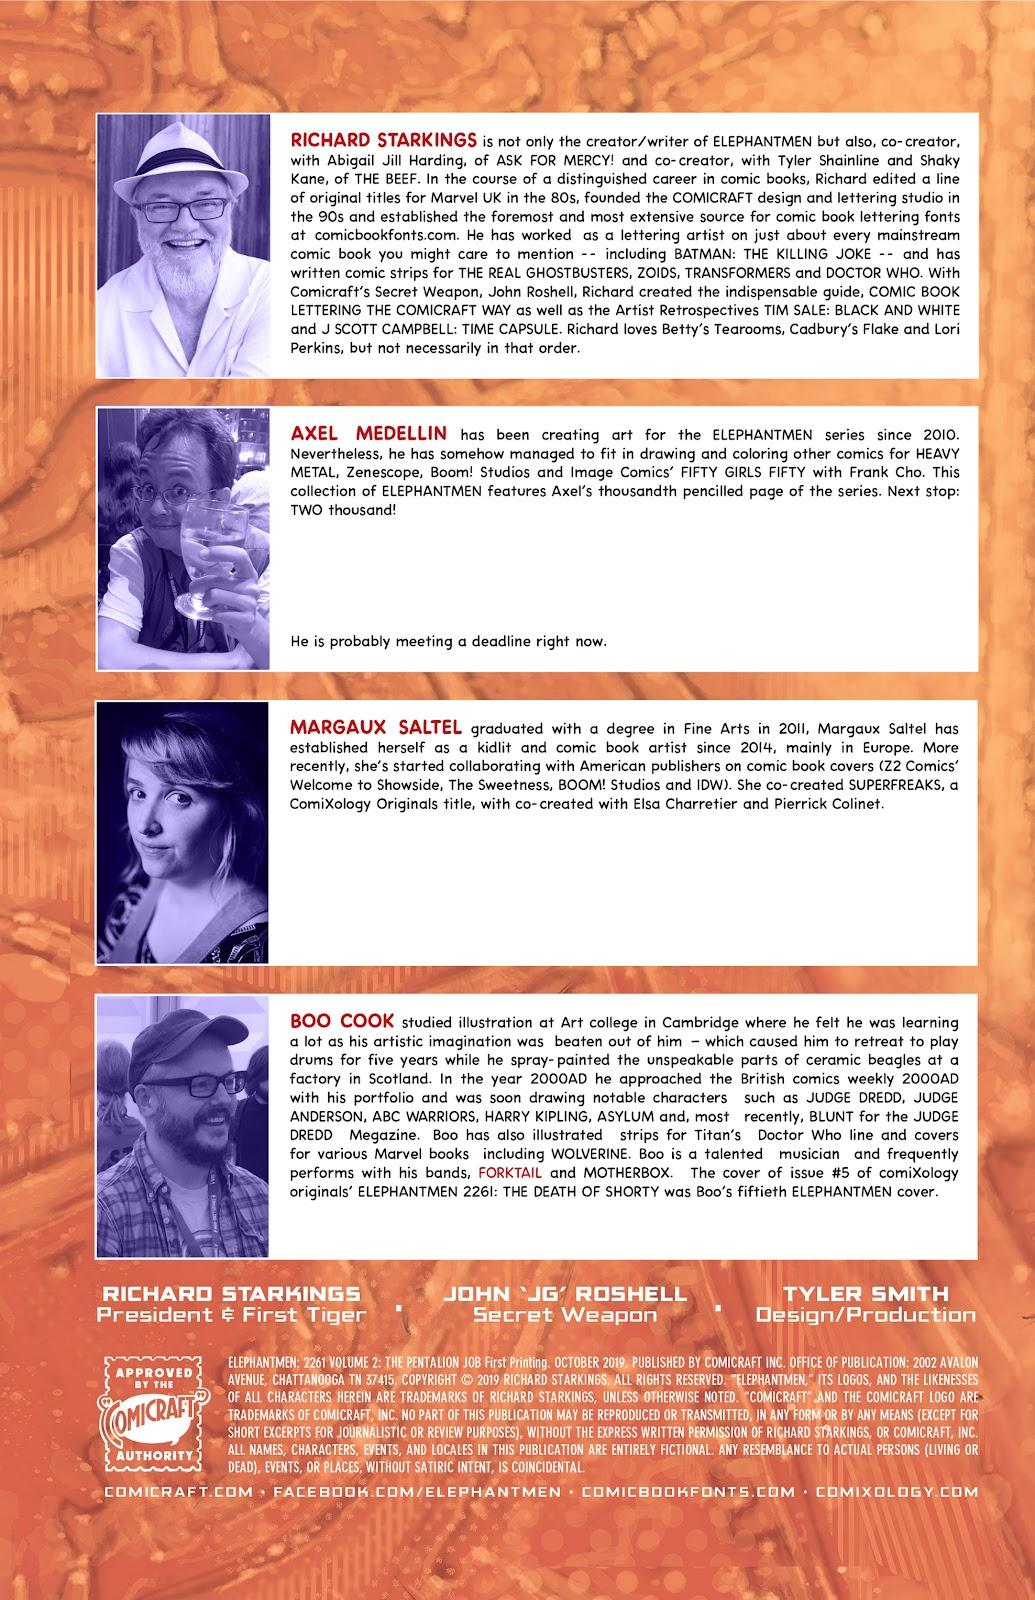 Read online Elephantmen 2261 Season Two: The Pentalion Job comic -  Issue # TPB - 5